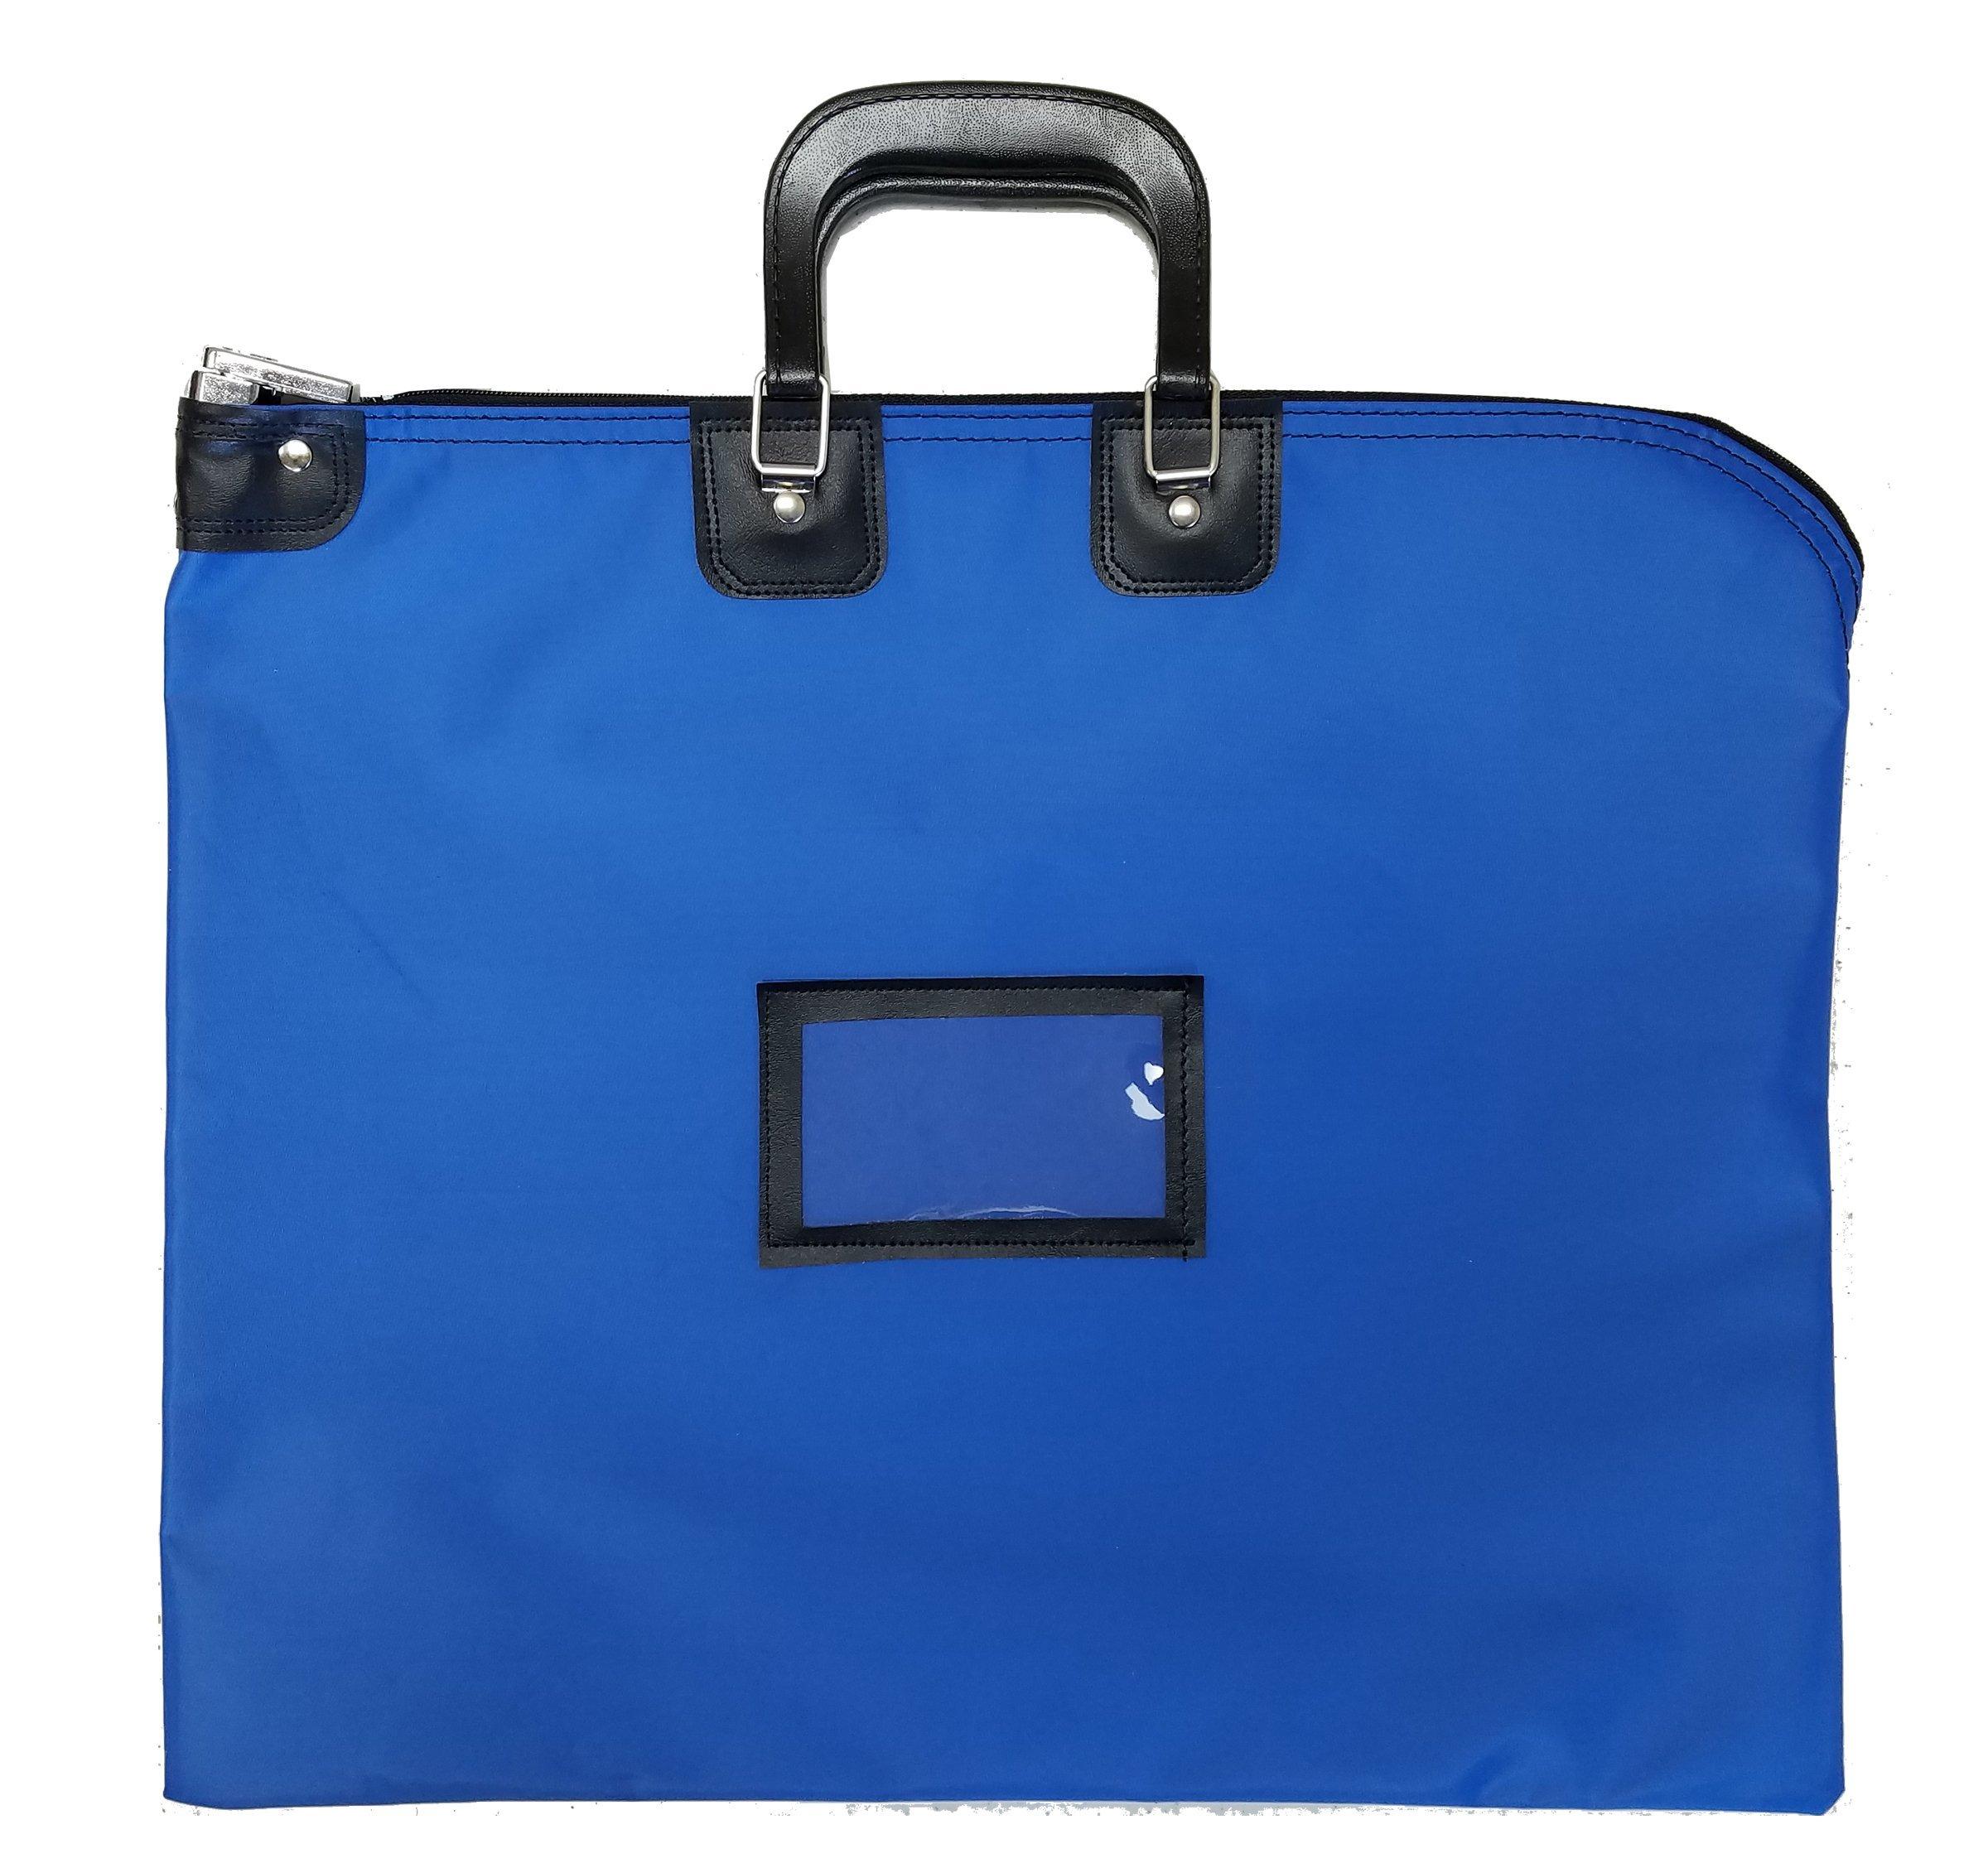 Locking Document HIPAA Bag 16 x 20 with Handles (Royal Blue)